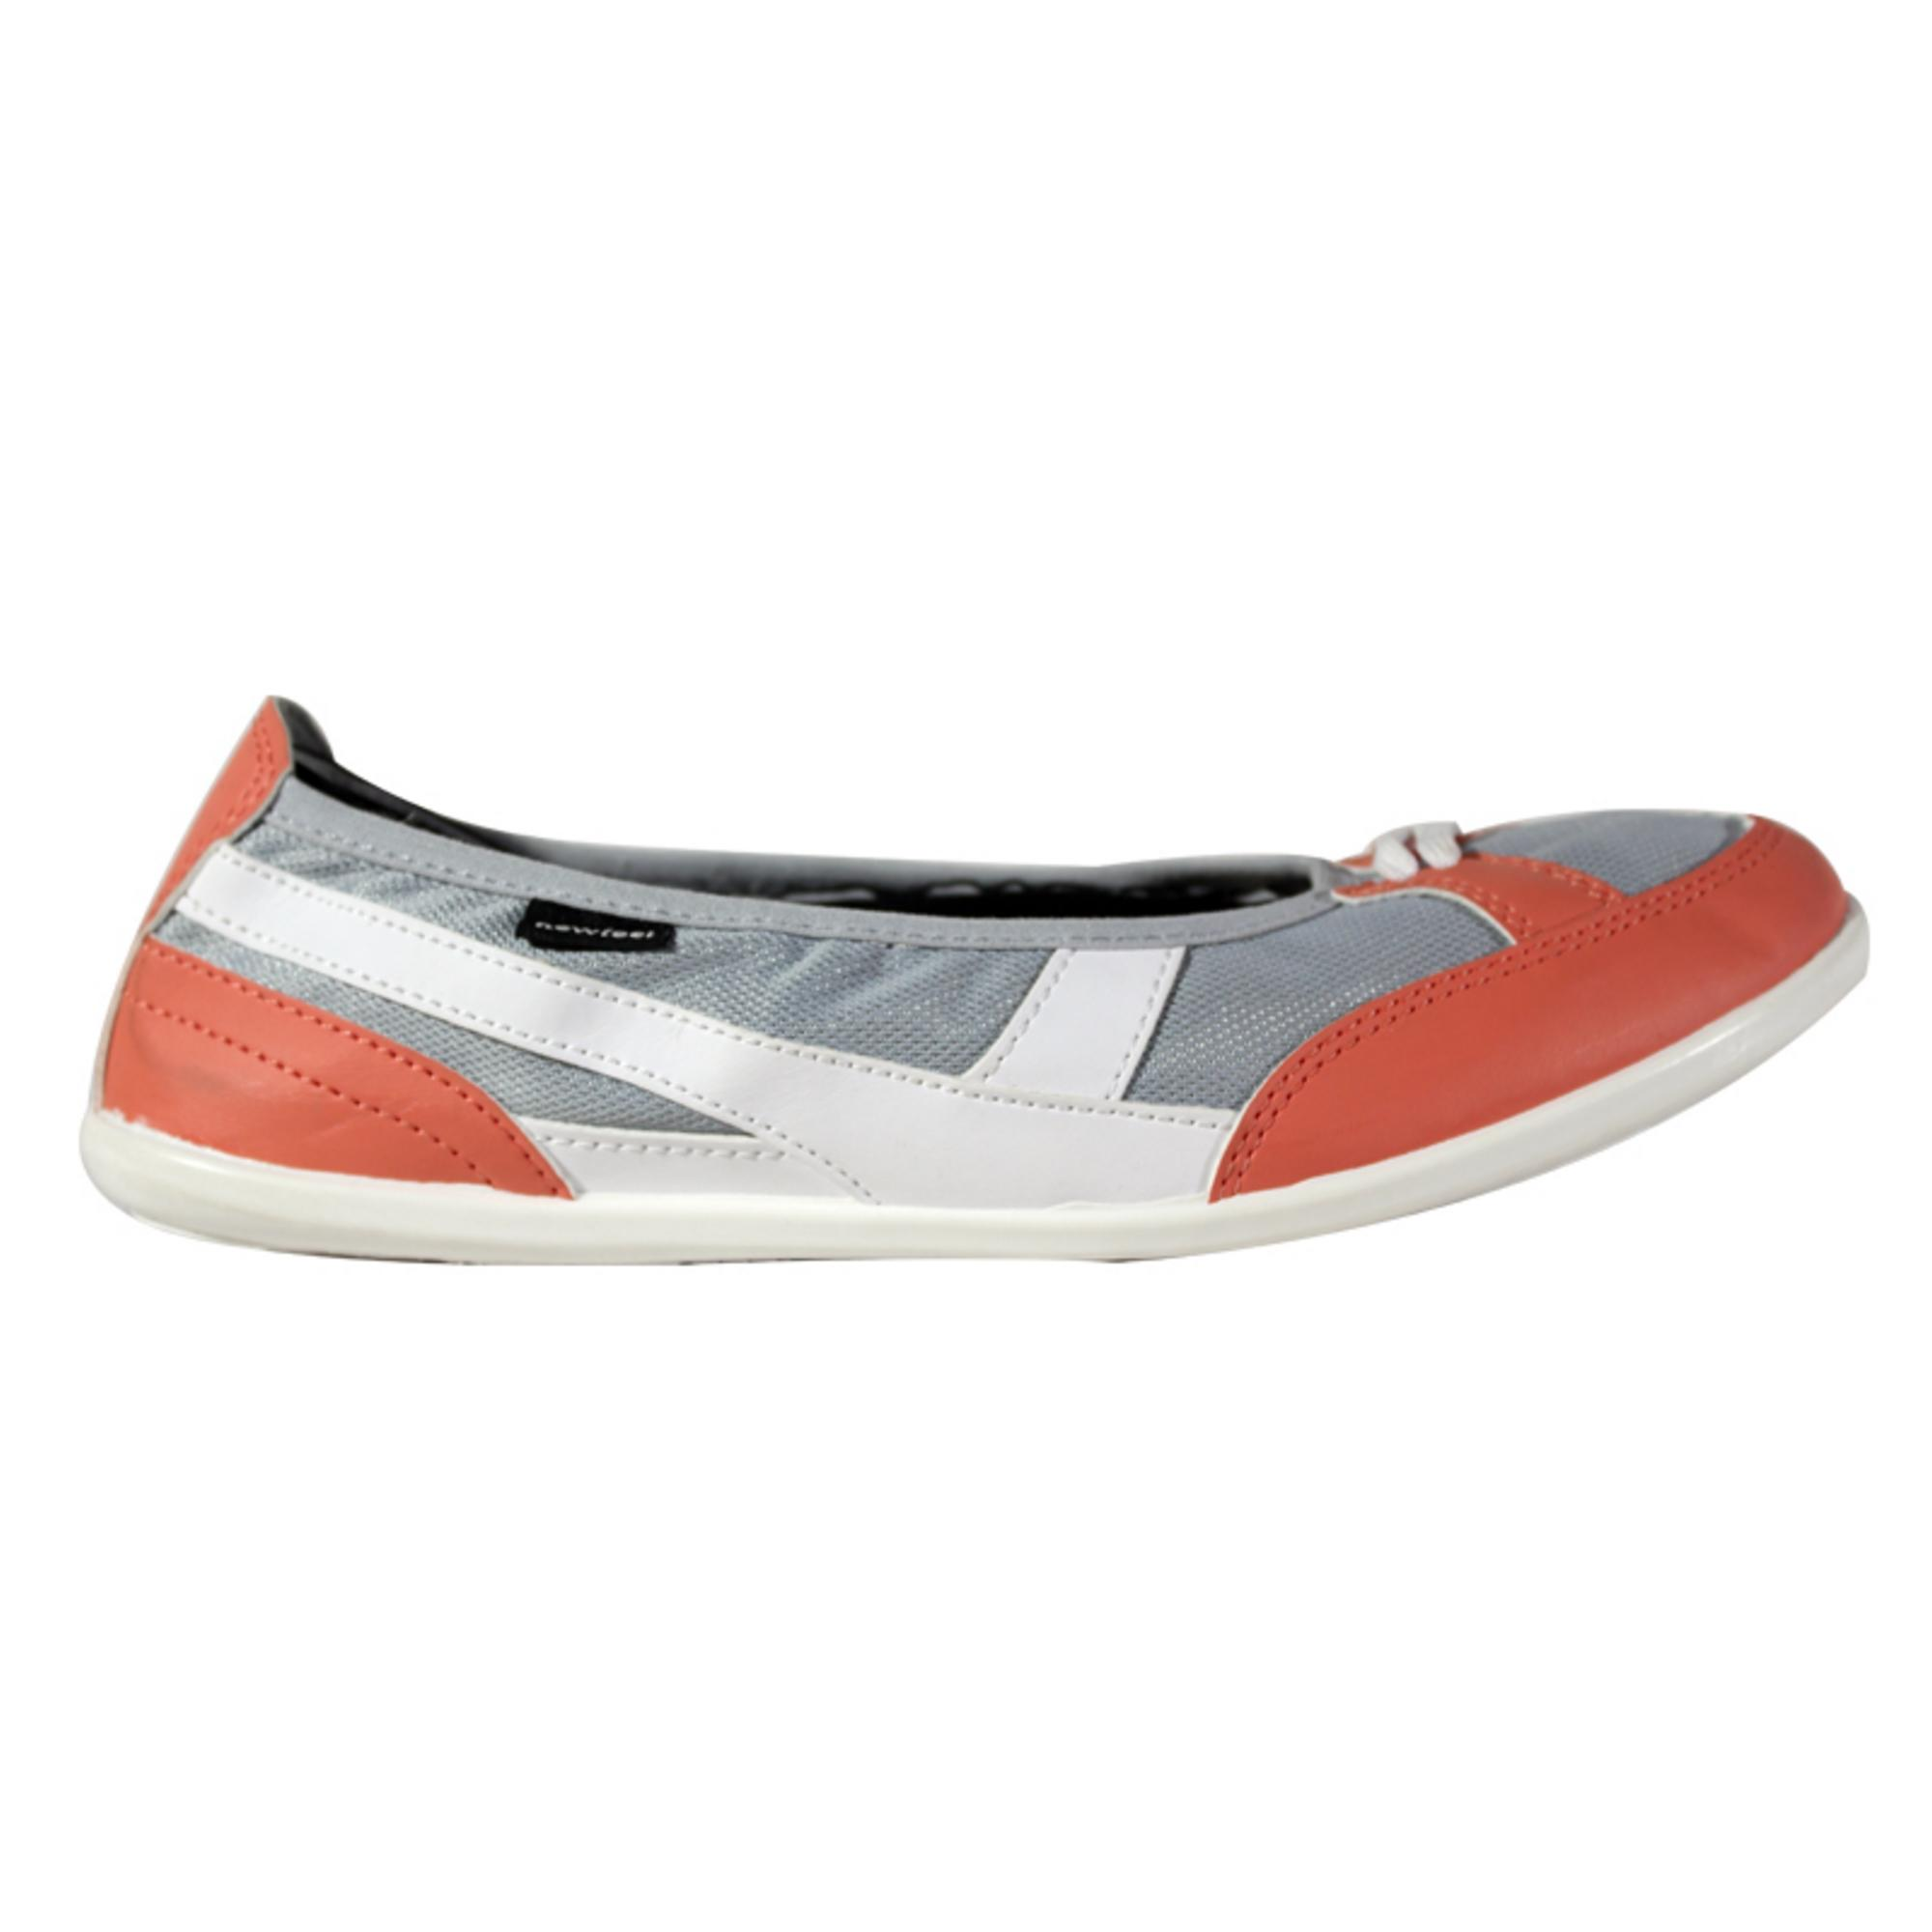 Walking shoes for women ballerina - Grey orange